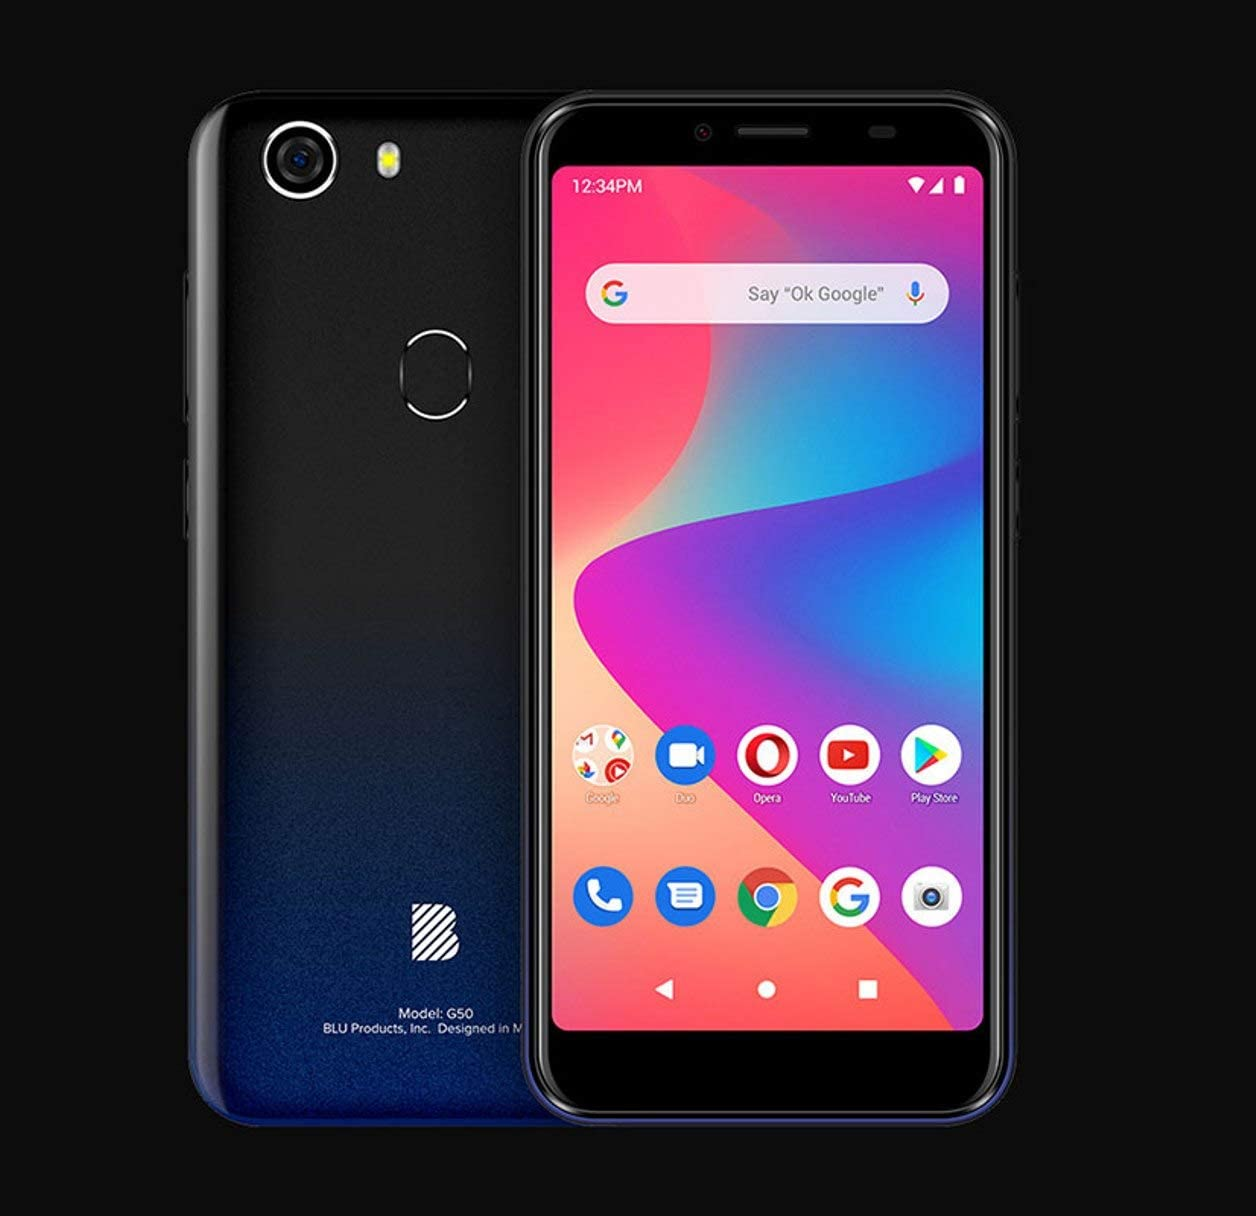 BLU G50 G0330WW 32GB GSM Unlocked Android Smart Phone - Black